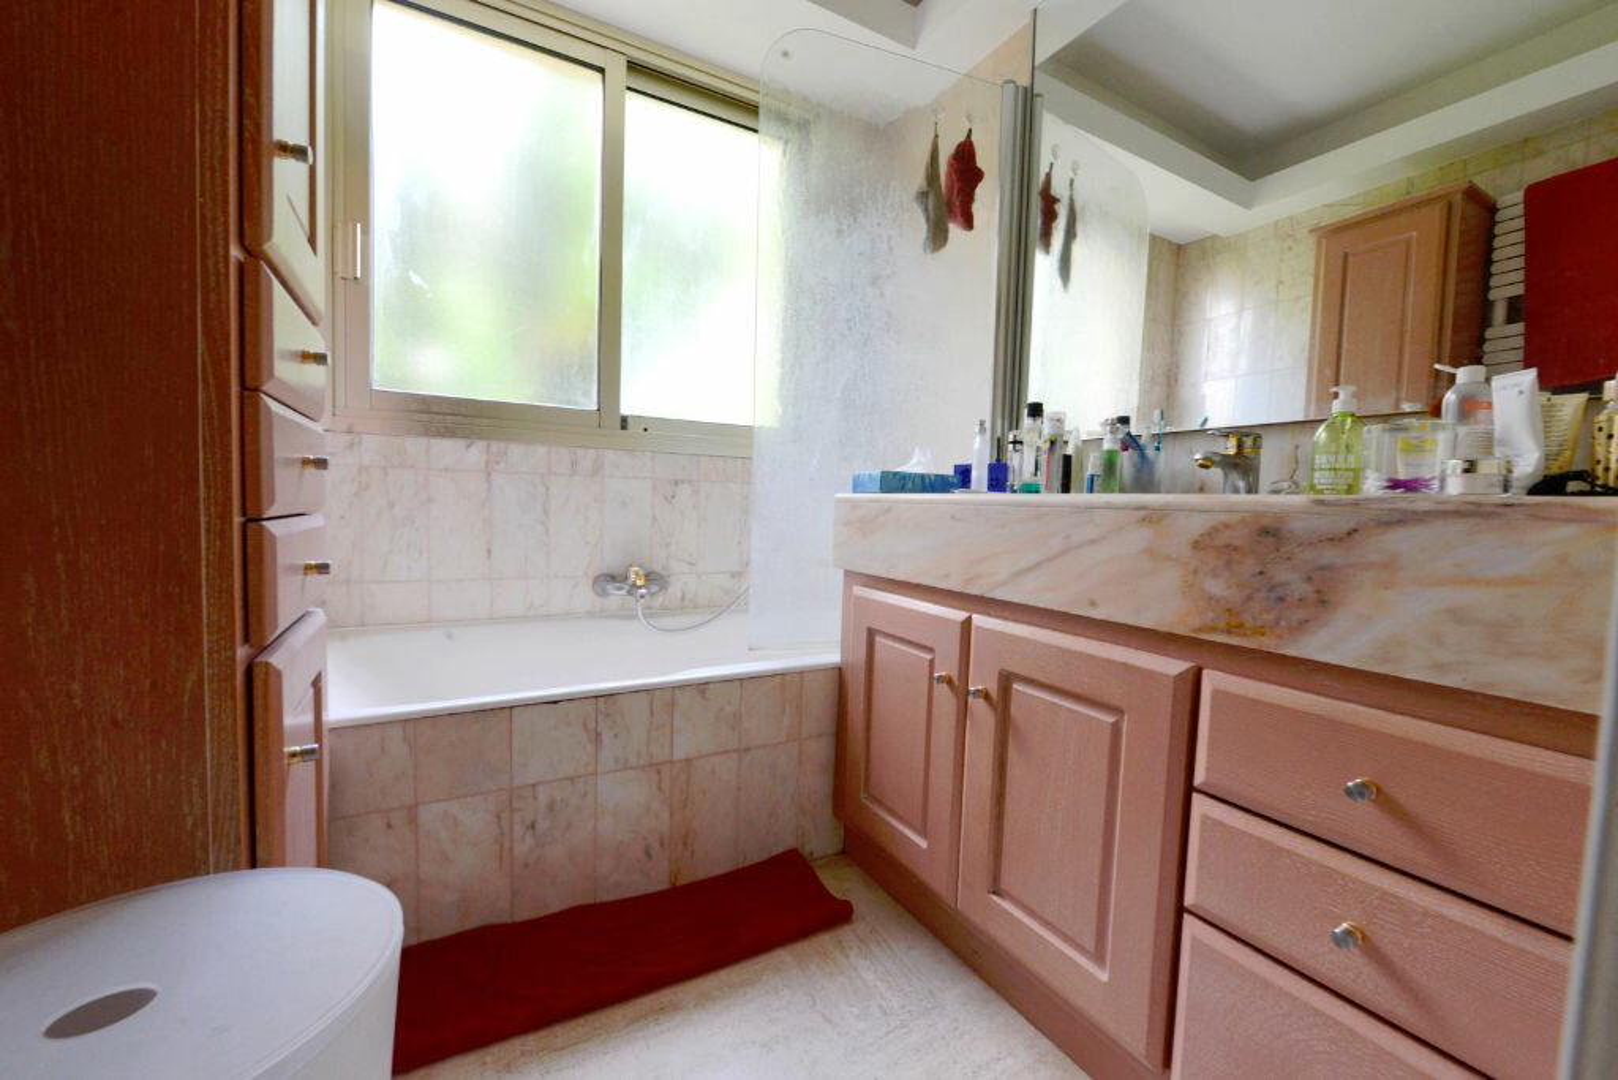 Appartement à vendre 3 69.3m2 à Grasse vignette-7